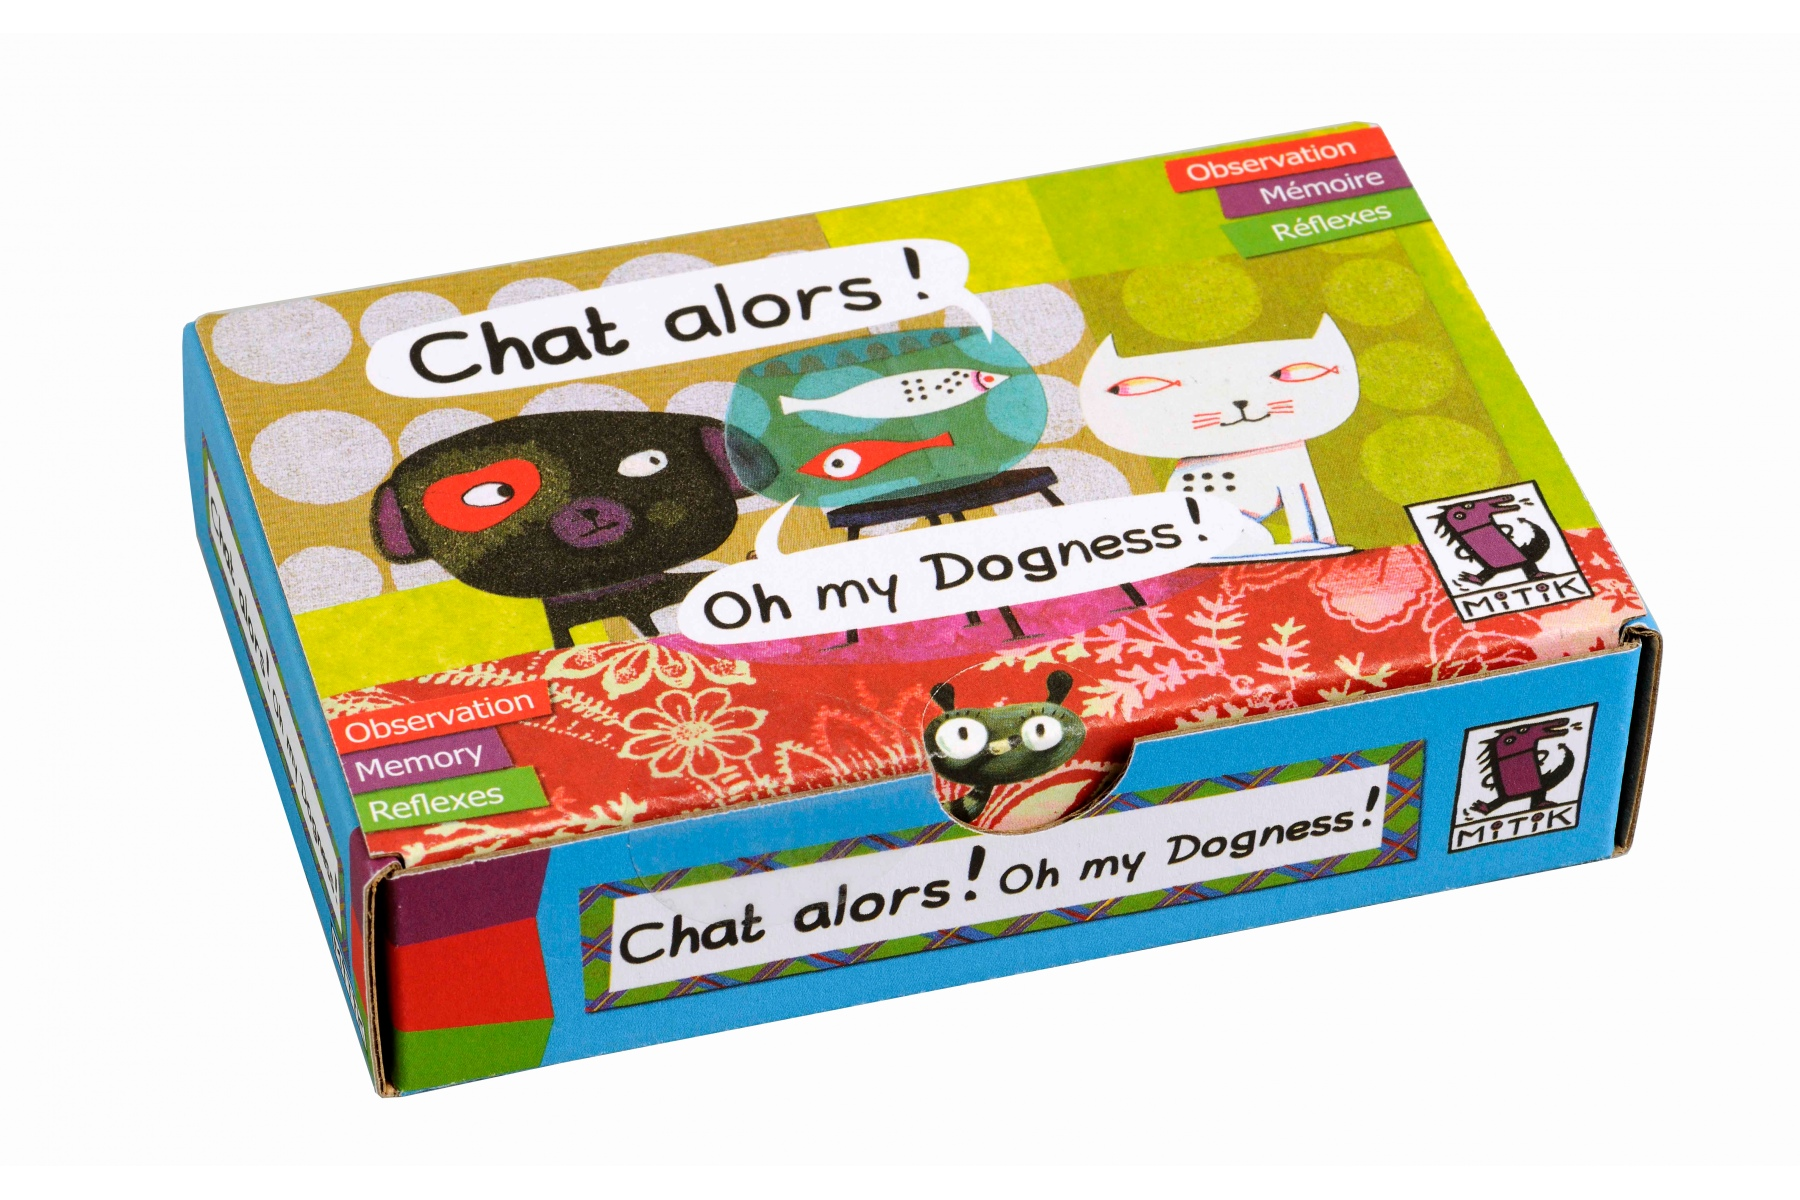 jeu de cartes chat alors jeu de cartes mitik made in france. Black Bedroom Furniture Sets. Home Design Ideas